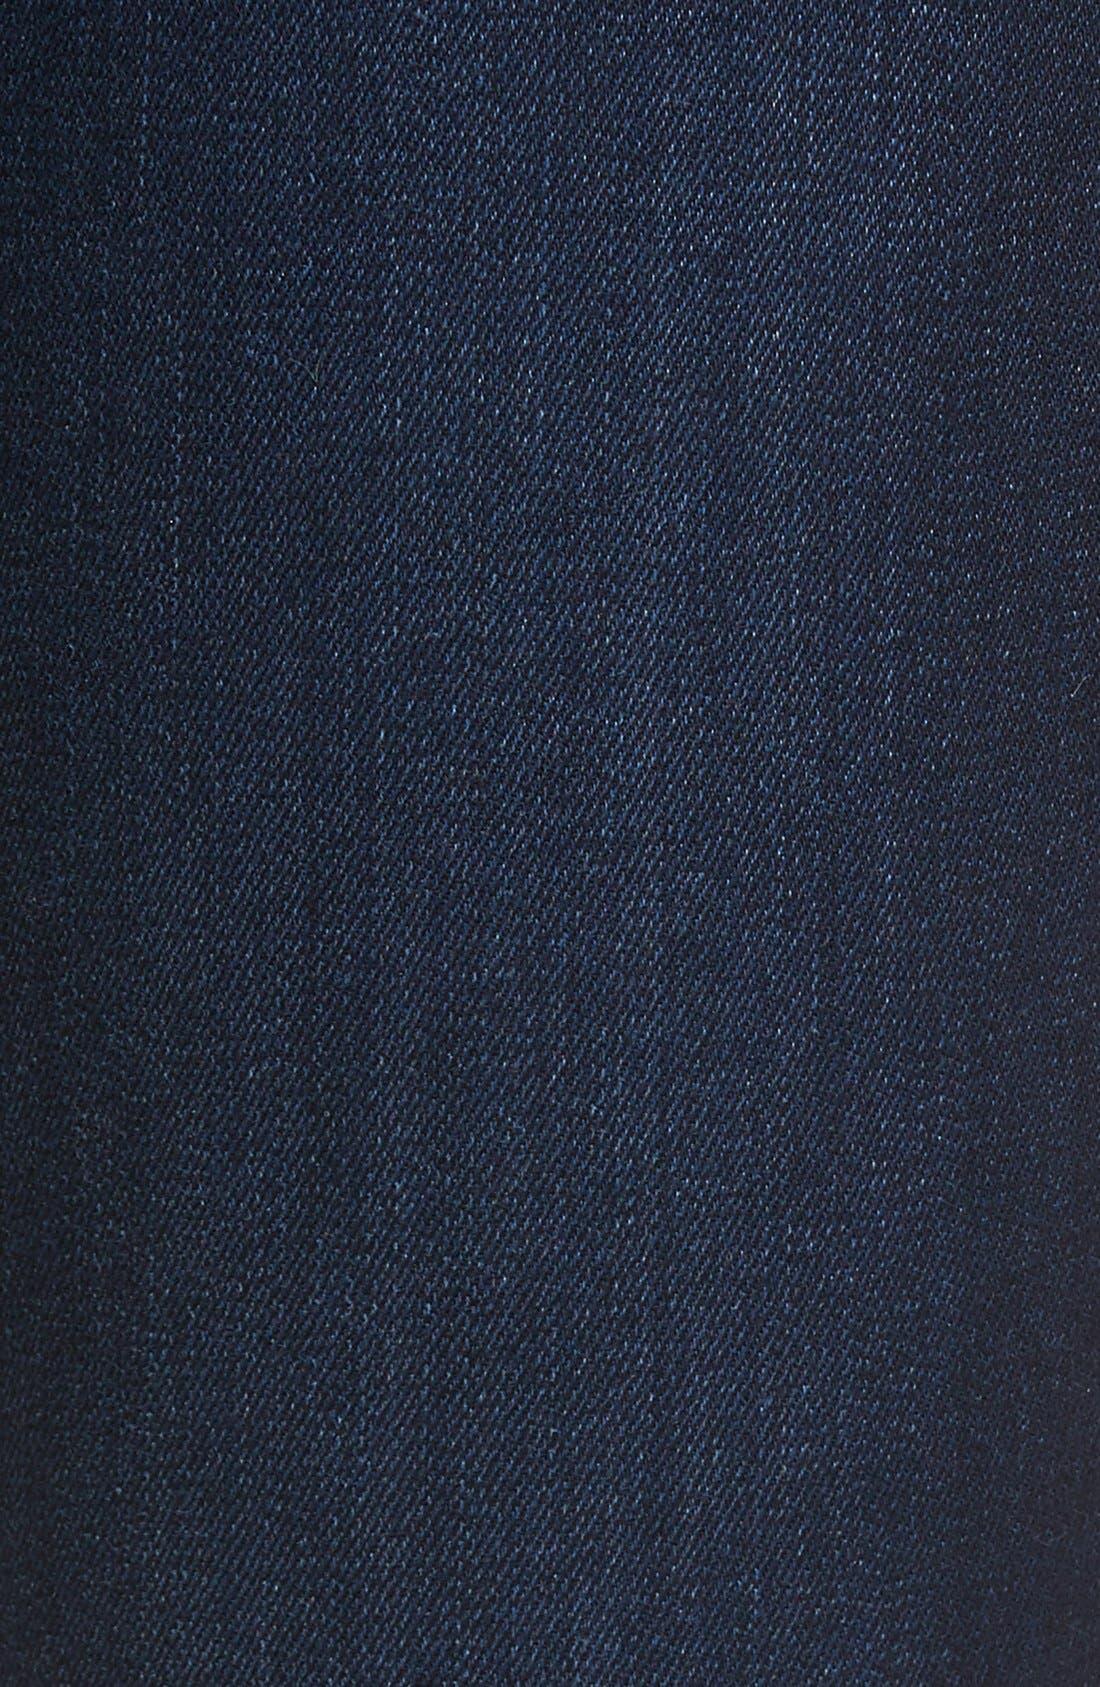 'Flawless - Honey' Curvy Skinny Jeans,                             Alternate thumbnail 3, color,                             SELMA